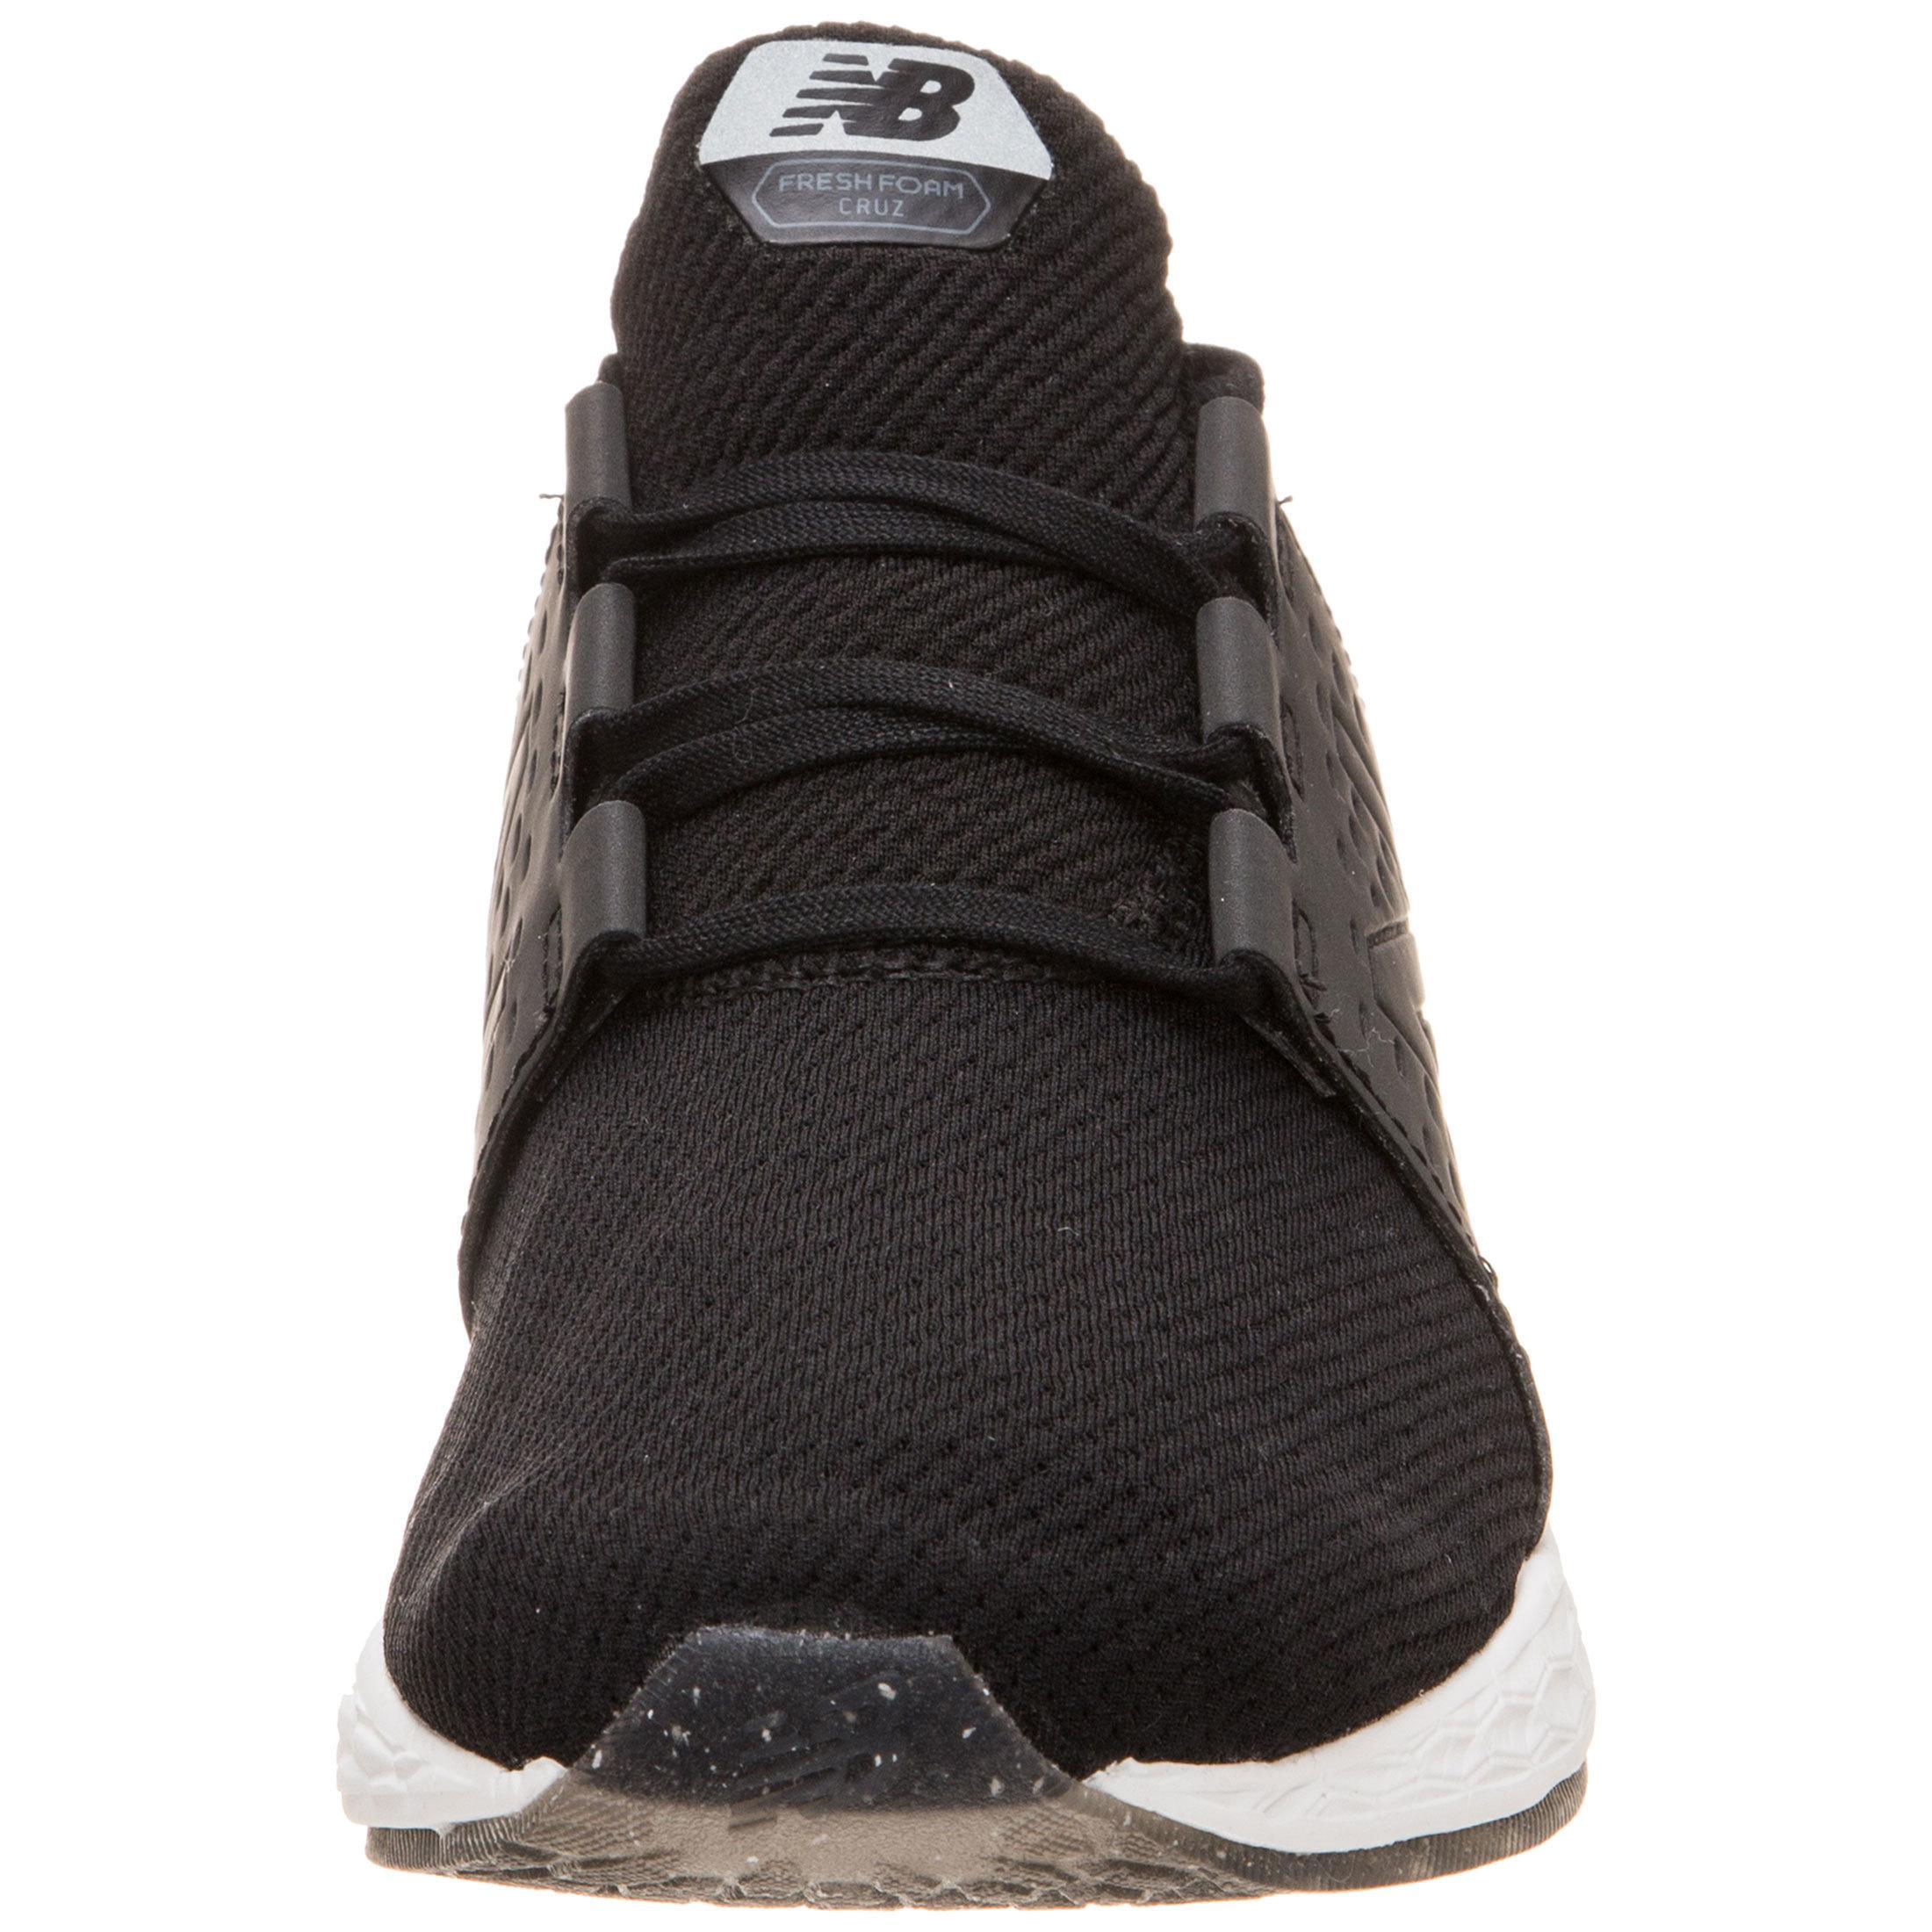 NEW BALANCE Foam Fresh Foam BALANCE Cruz Laufschuhe Damen schwarz / grau im Online Shop von SportScheck kaufen Gute Qualität beliebte Schuhe d7d5e1